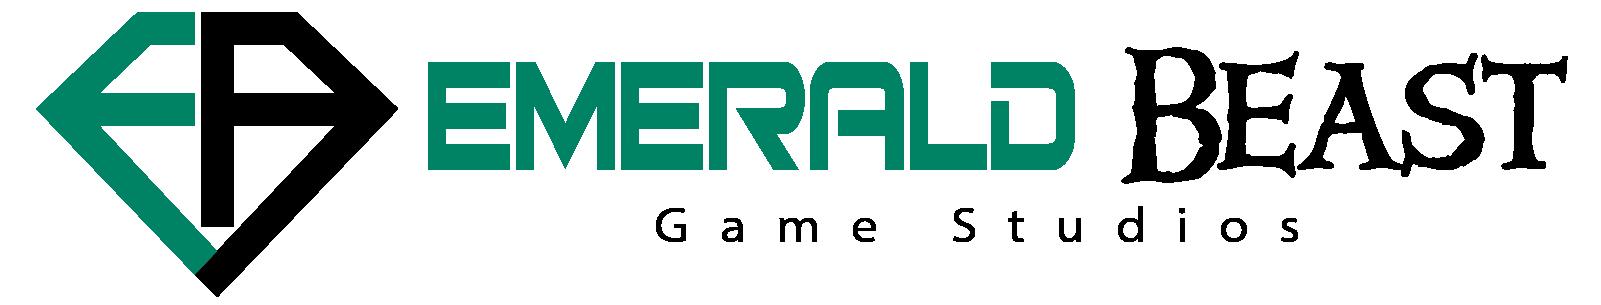 Emerald Beast Game Studios